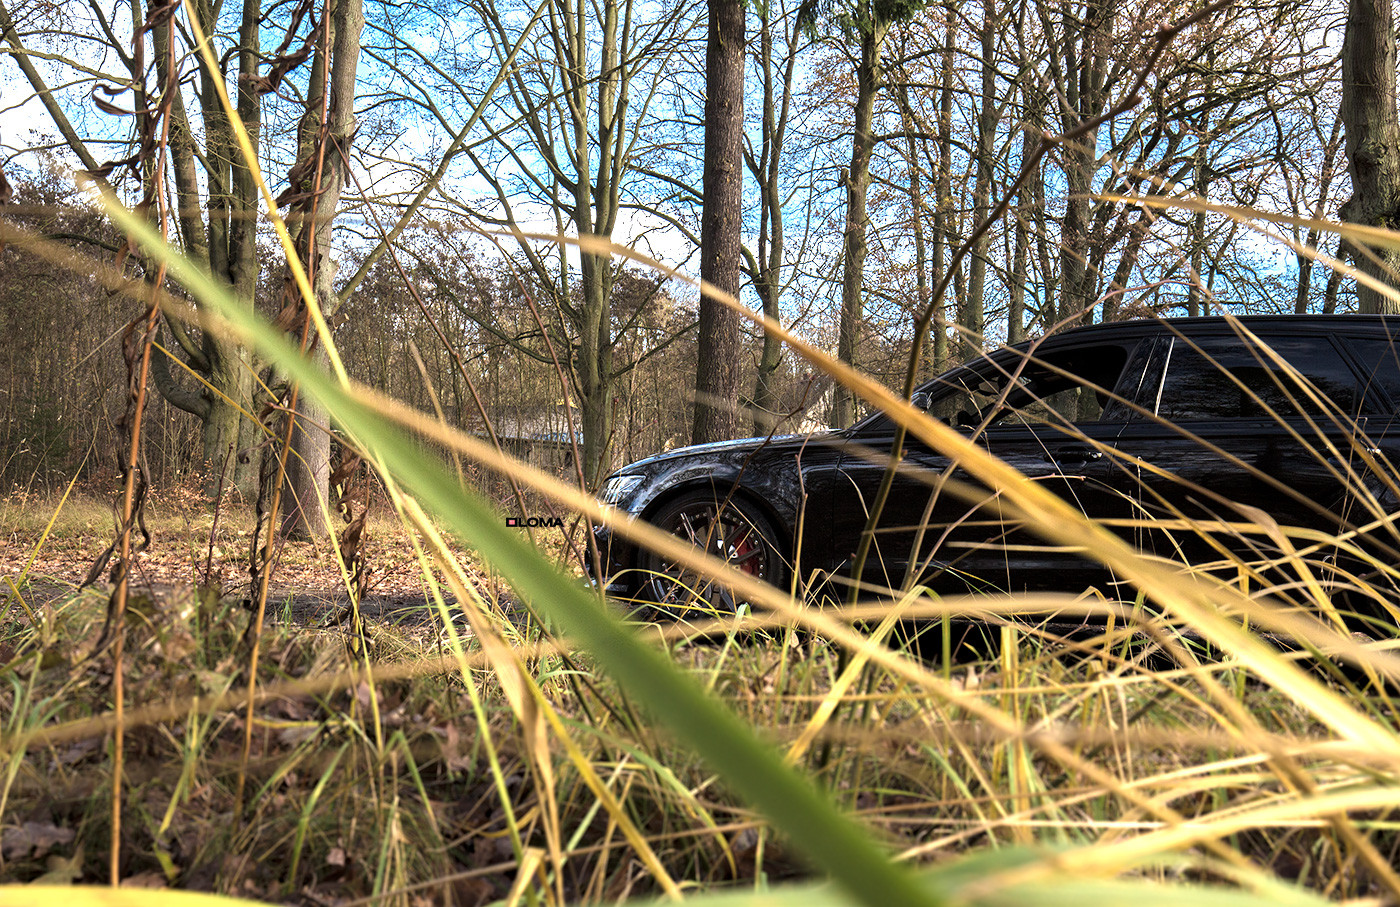 AUDI RS6 CUSTOM FORGED WHEELS.